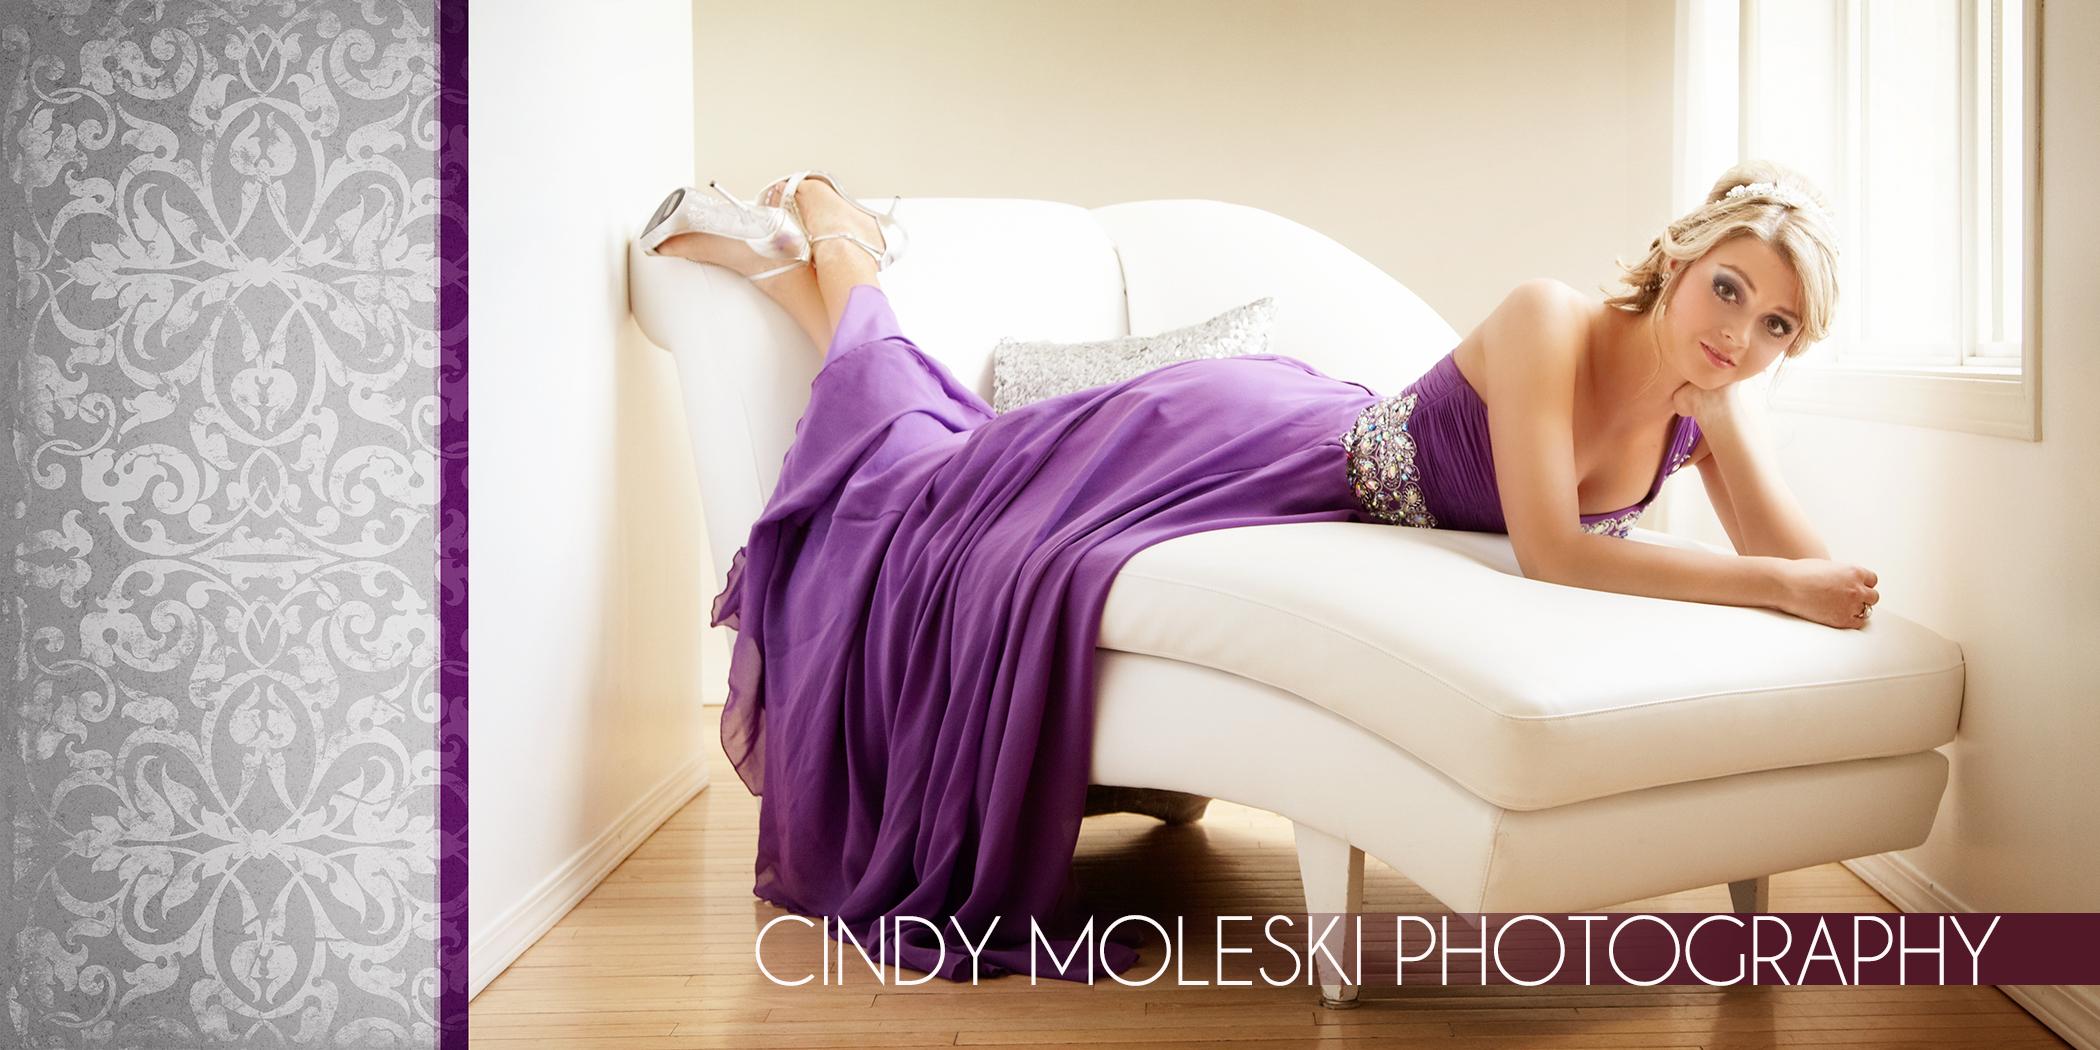 Lara-003 cover-cindy moleski-professional photographer-grade 12 grad-graduate-graduation-saskatoon-saskatchewan.jpg